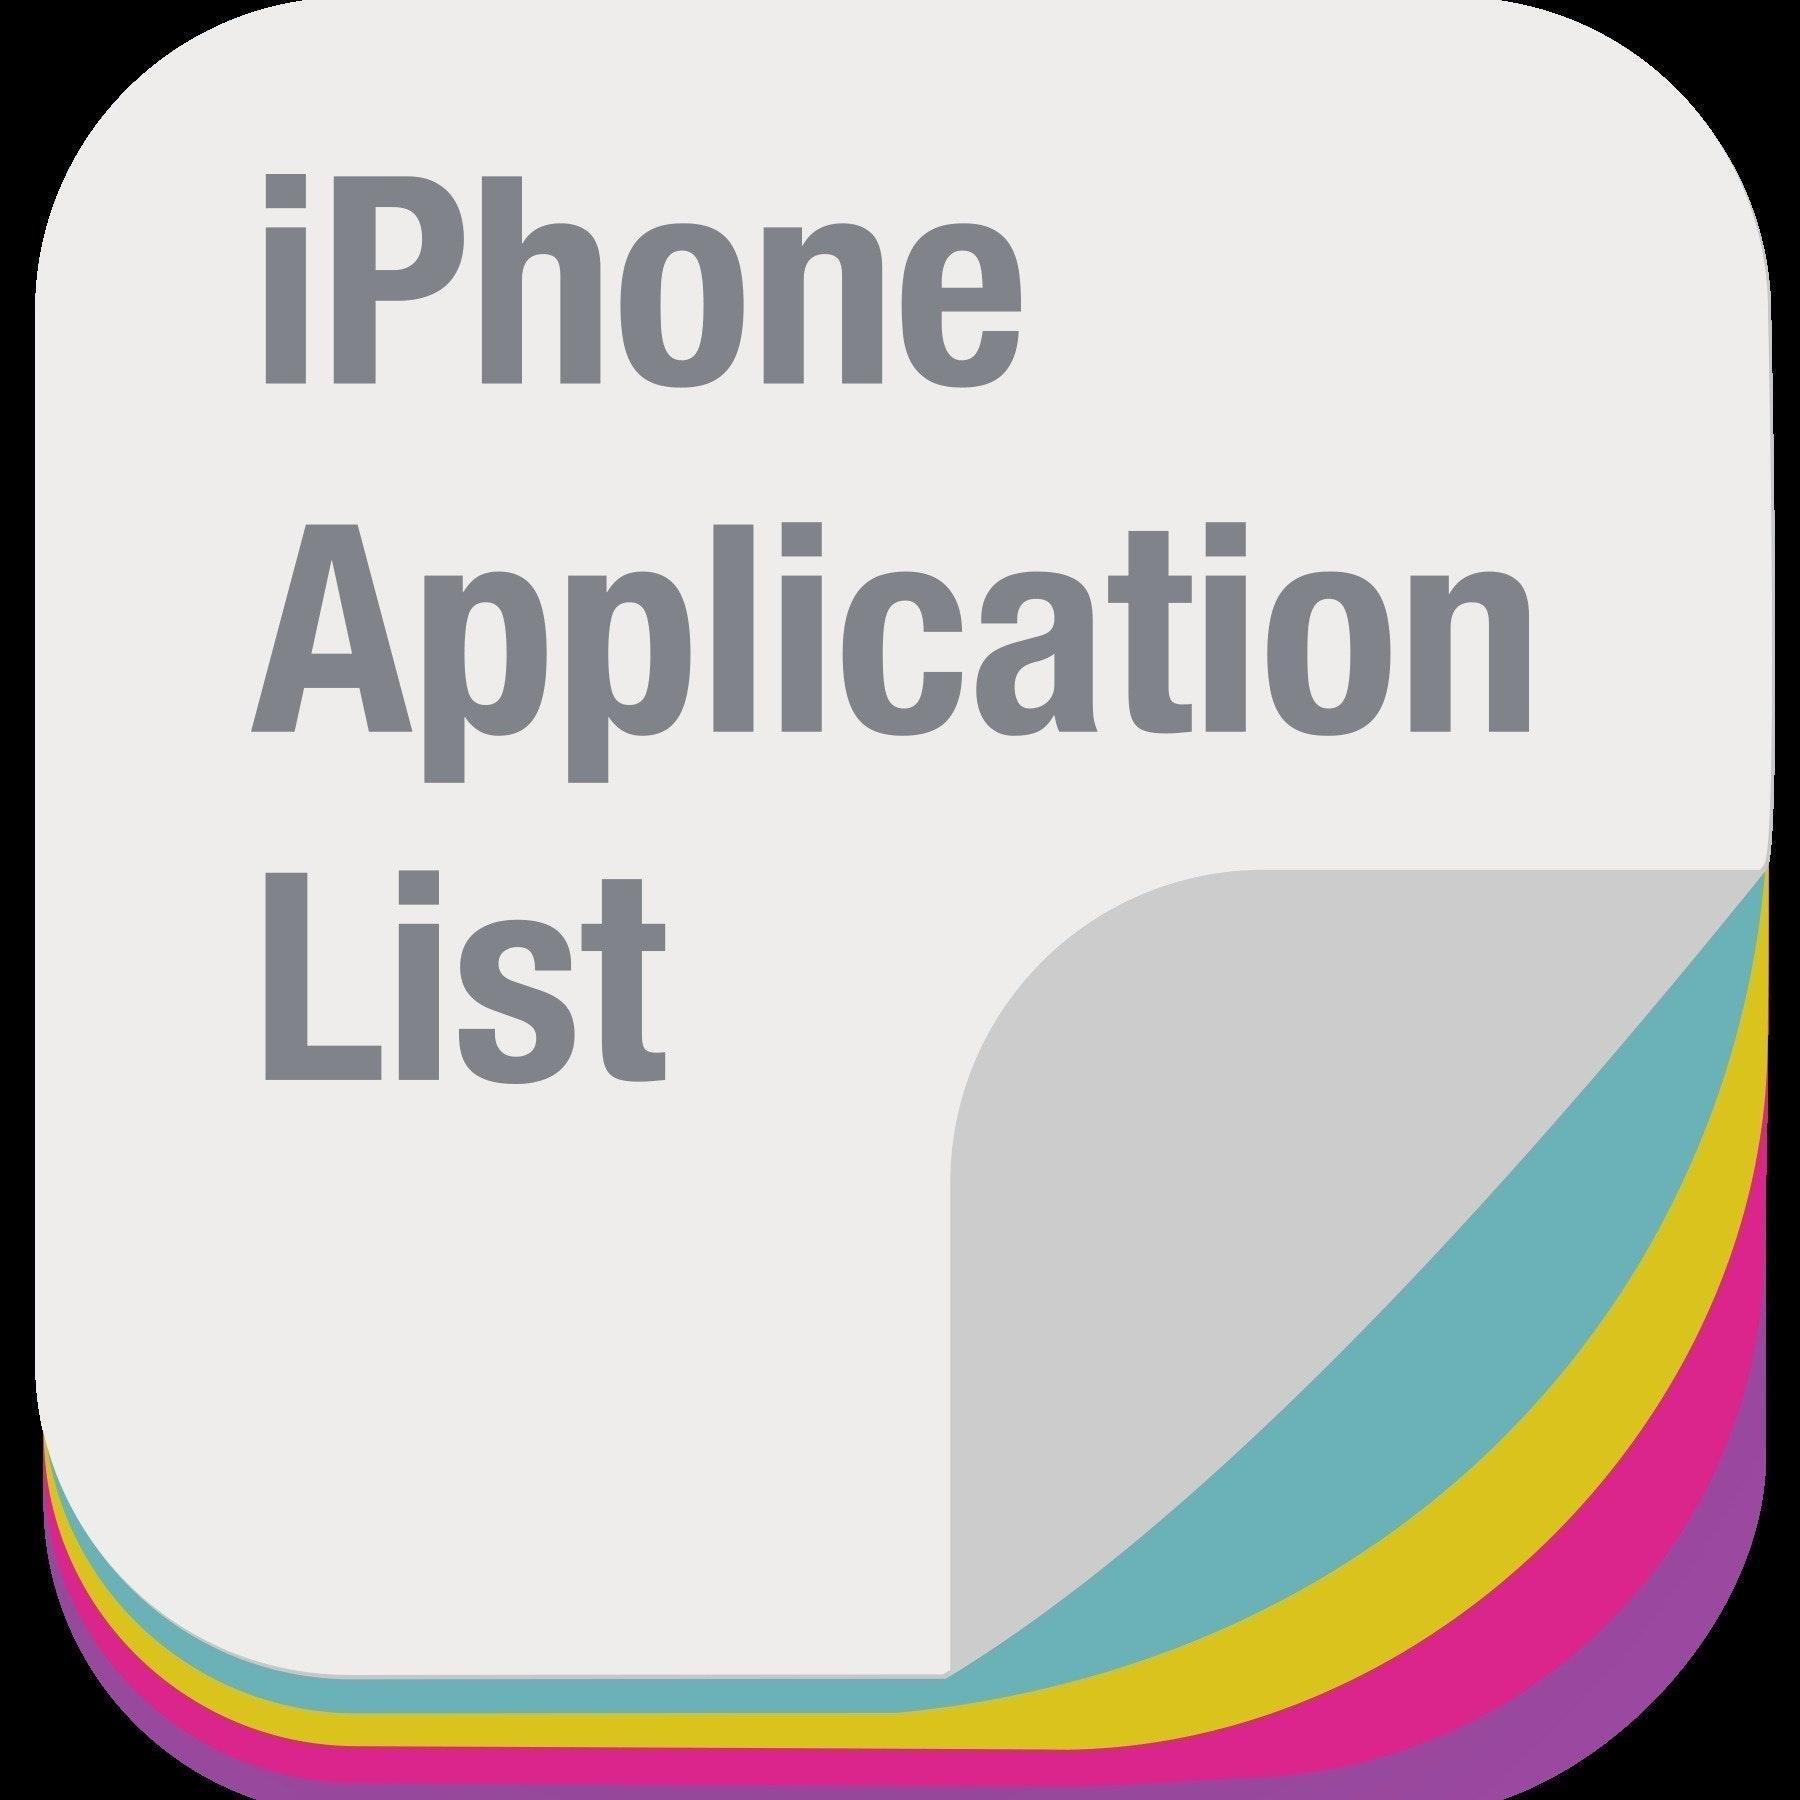 iPhone App List